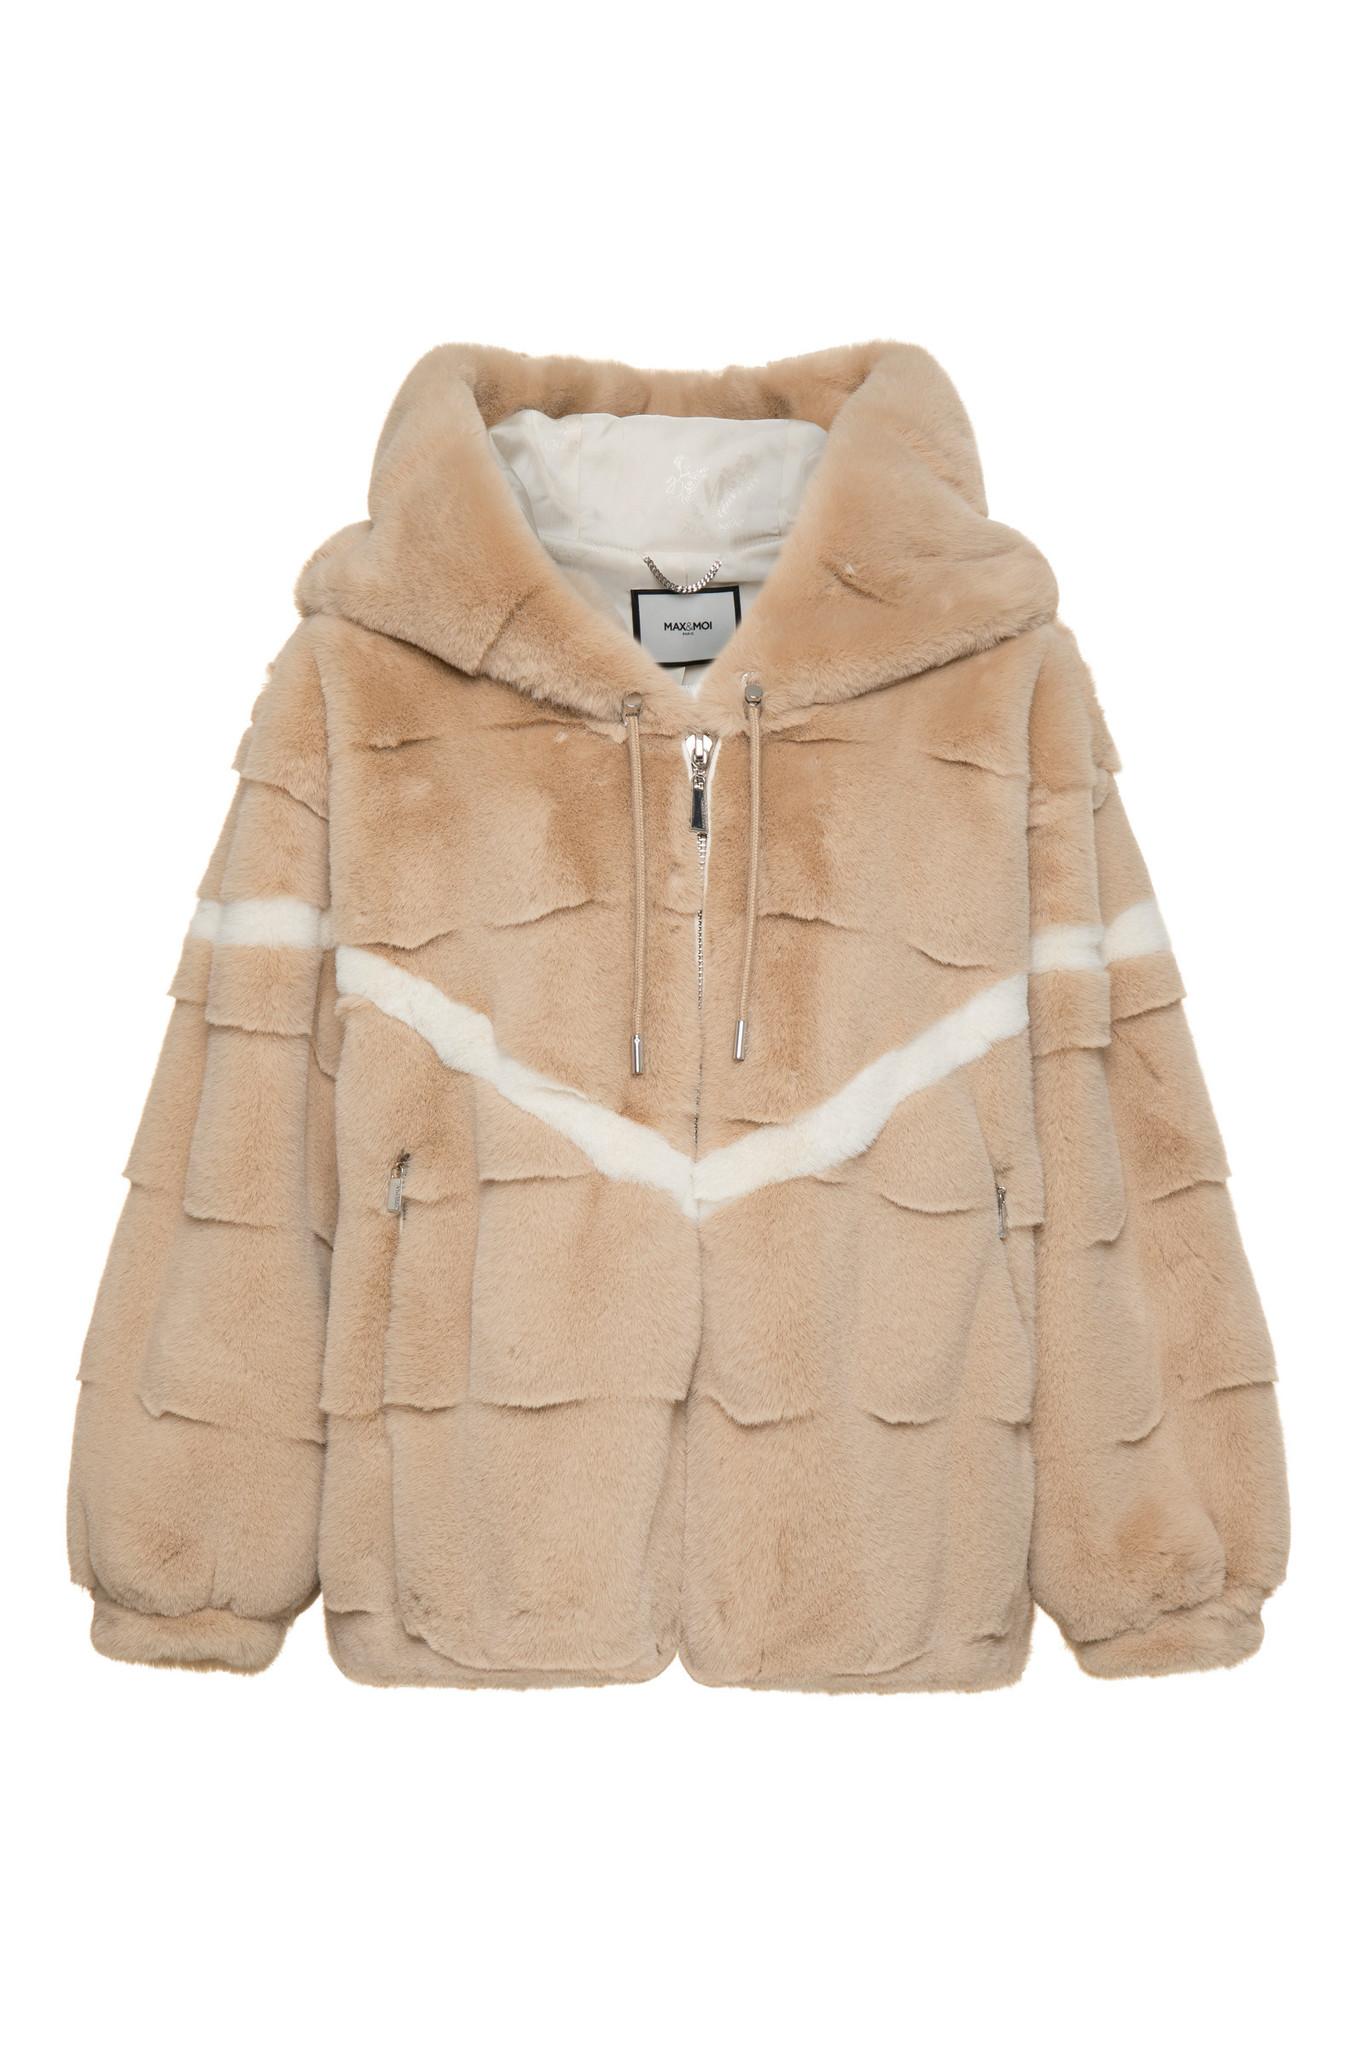 Vavangue coat Max et Moi-3